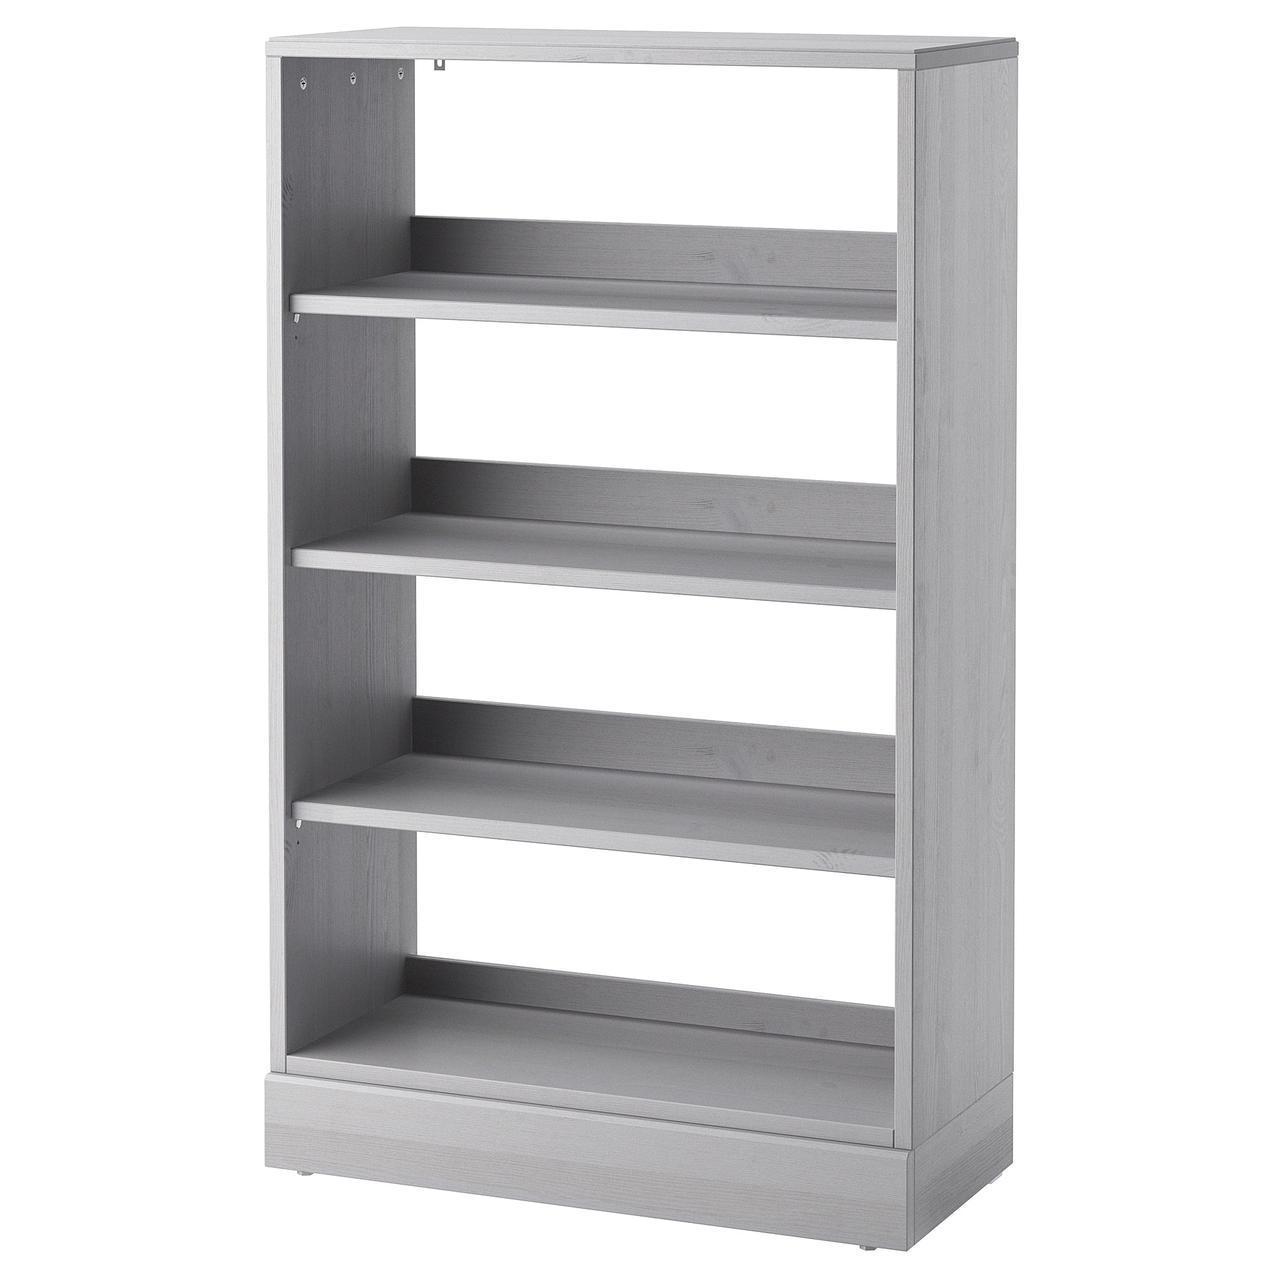 Стеллаж IKEA HAVSTA 81x134x37 см серый 492.750.88